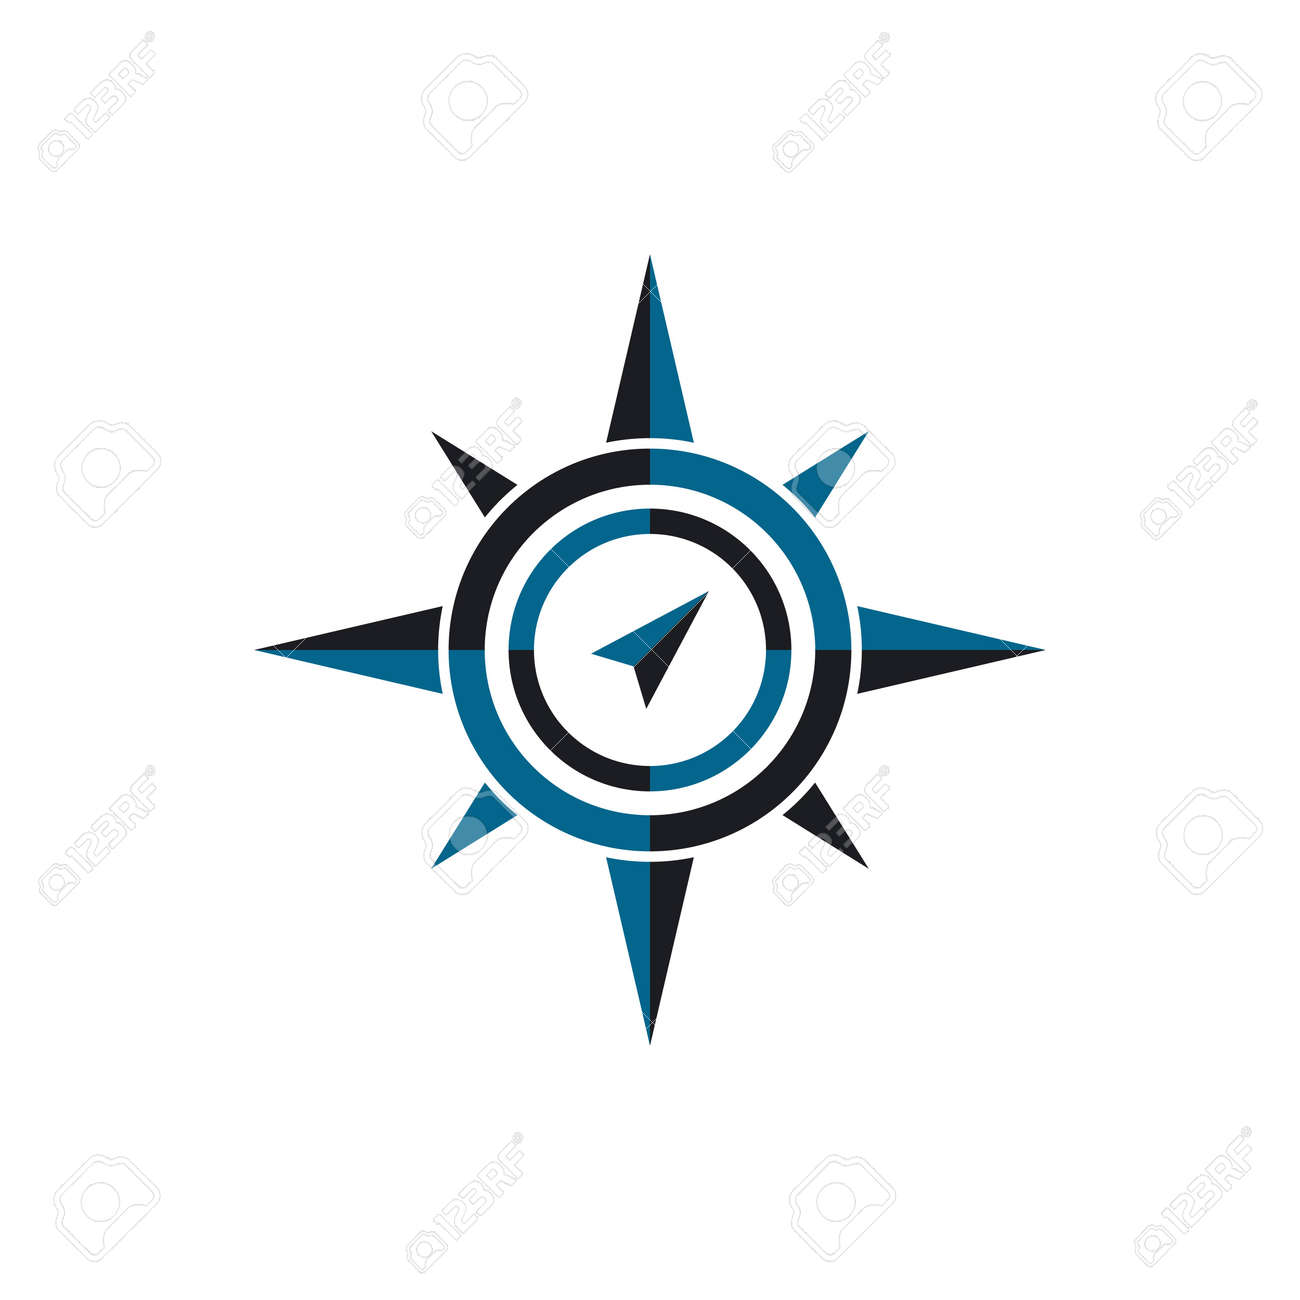 Compass Logo Template vector icon illustration design - 157741510